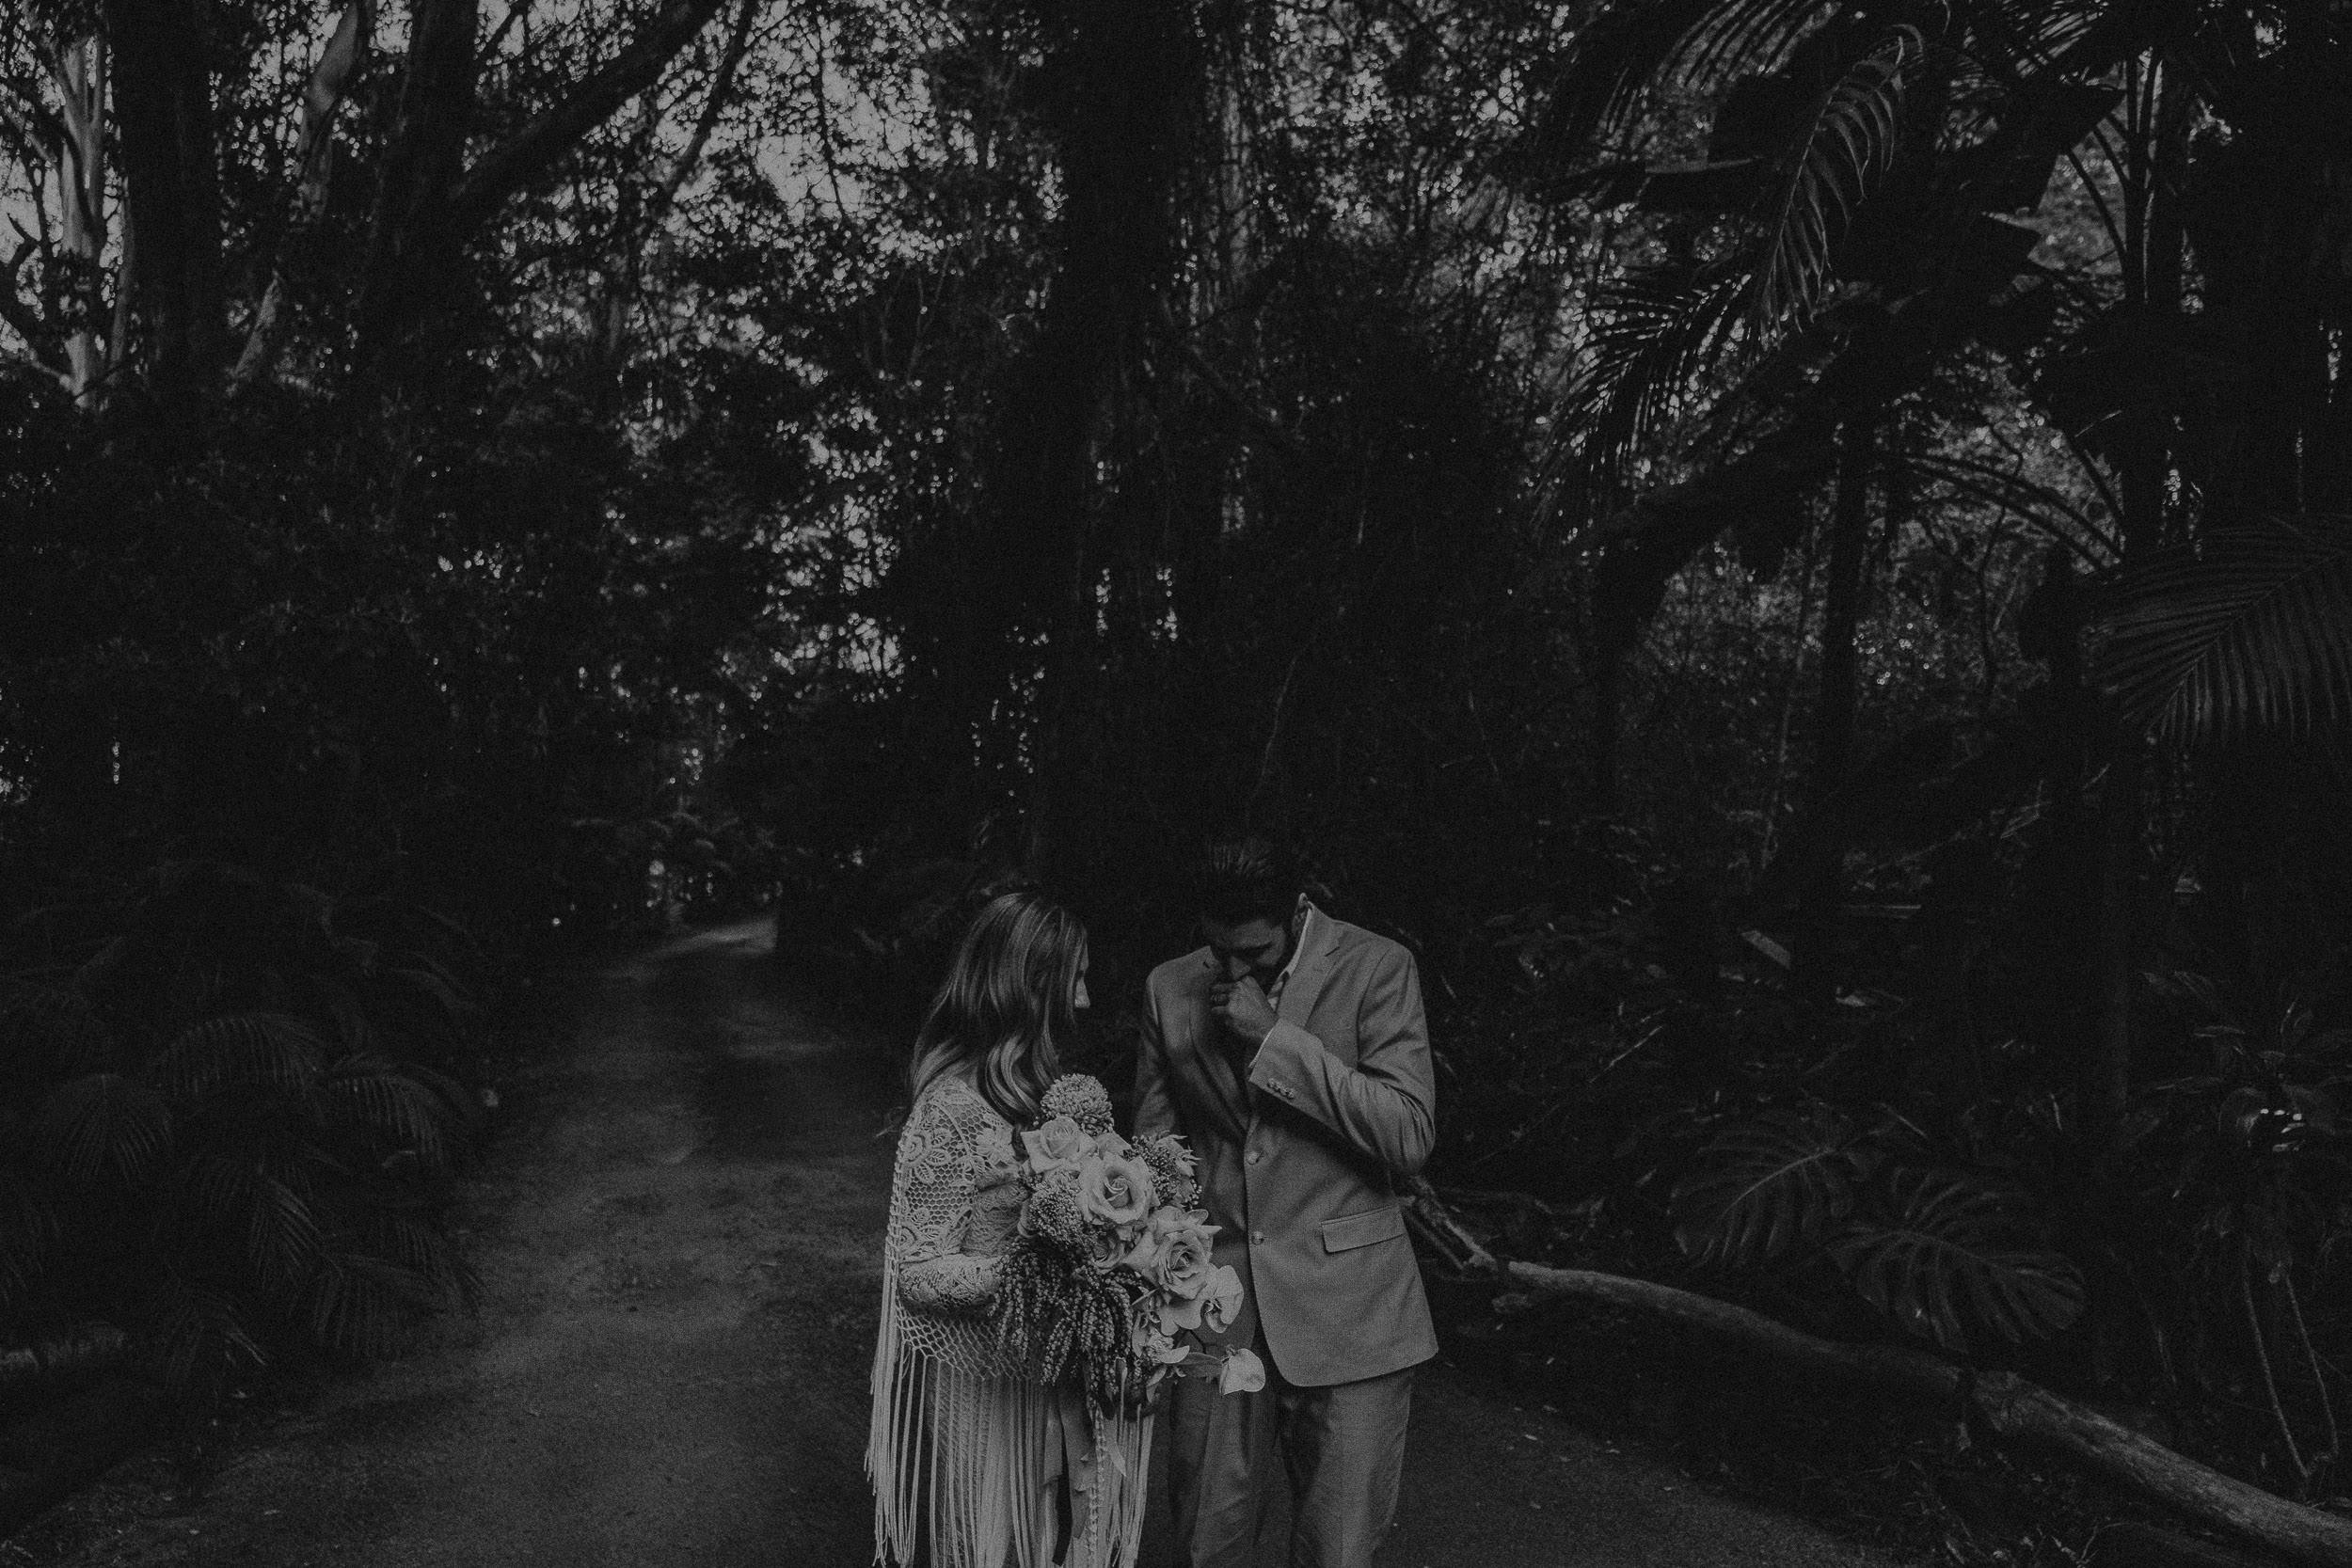 S&A Elopement - Kings & Thieves - Shred 'Til Dead - Central Coast Beach Forest Wedding - 311.jpg